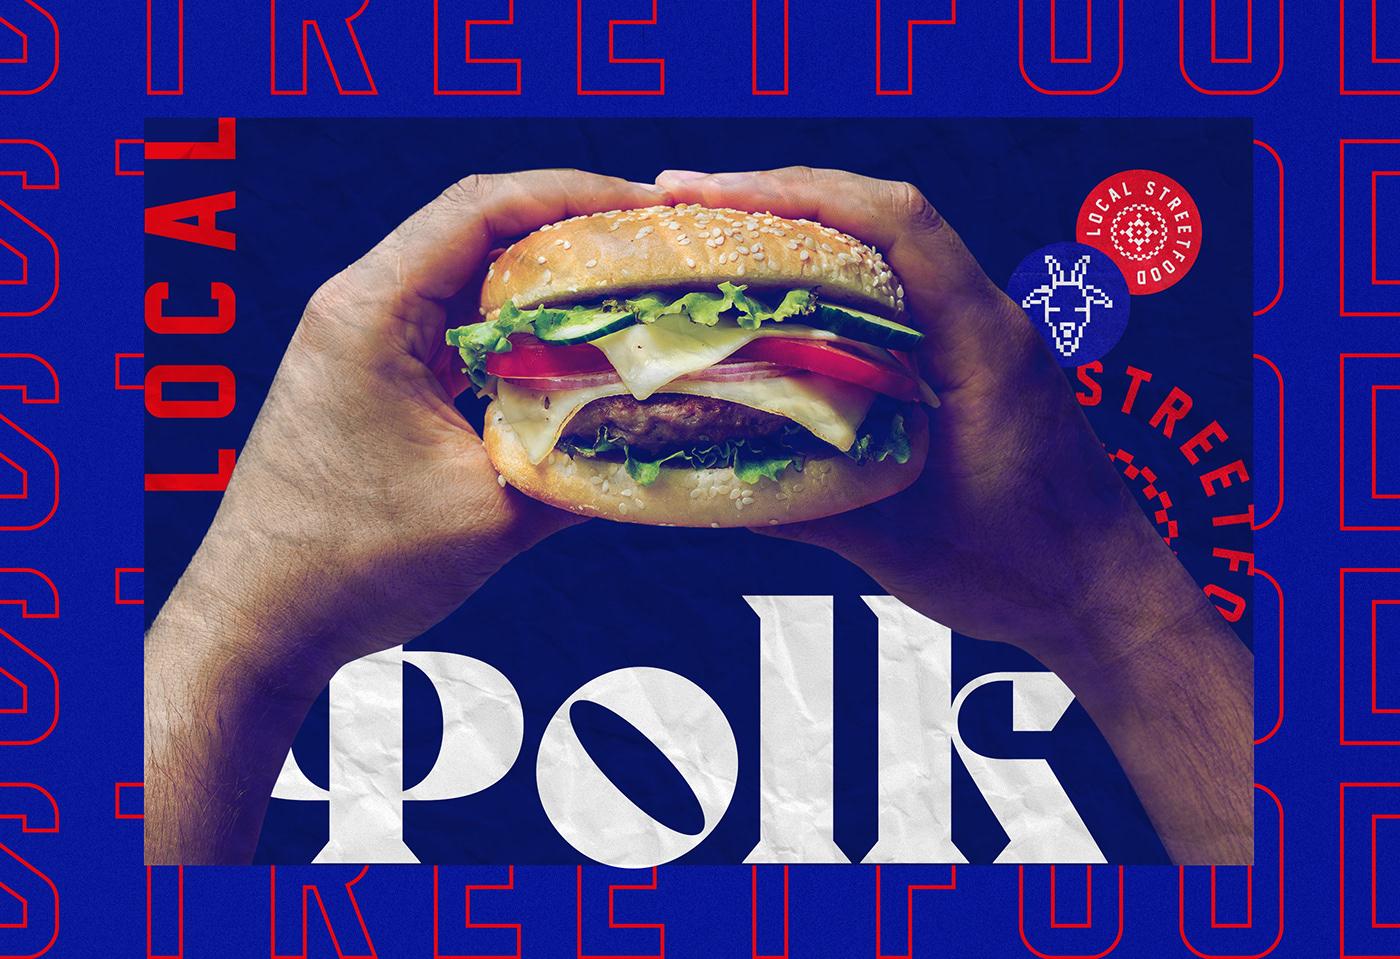 Folk local street food cafe restaurant branding by iFrame Design Studio